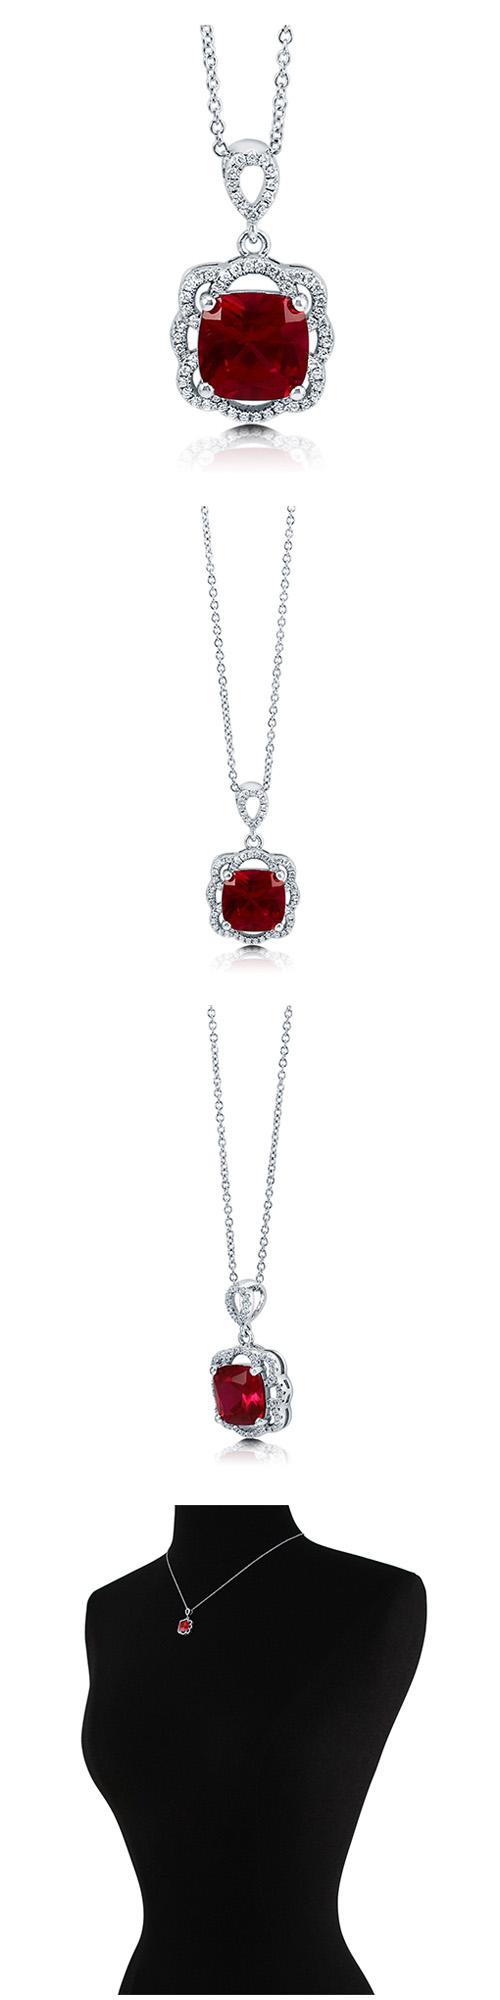 Sterling Silver Cushion CZ Flower Fashion Necklace